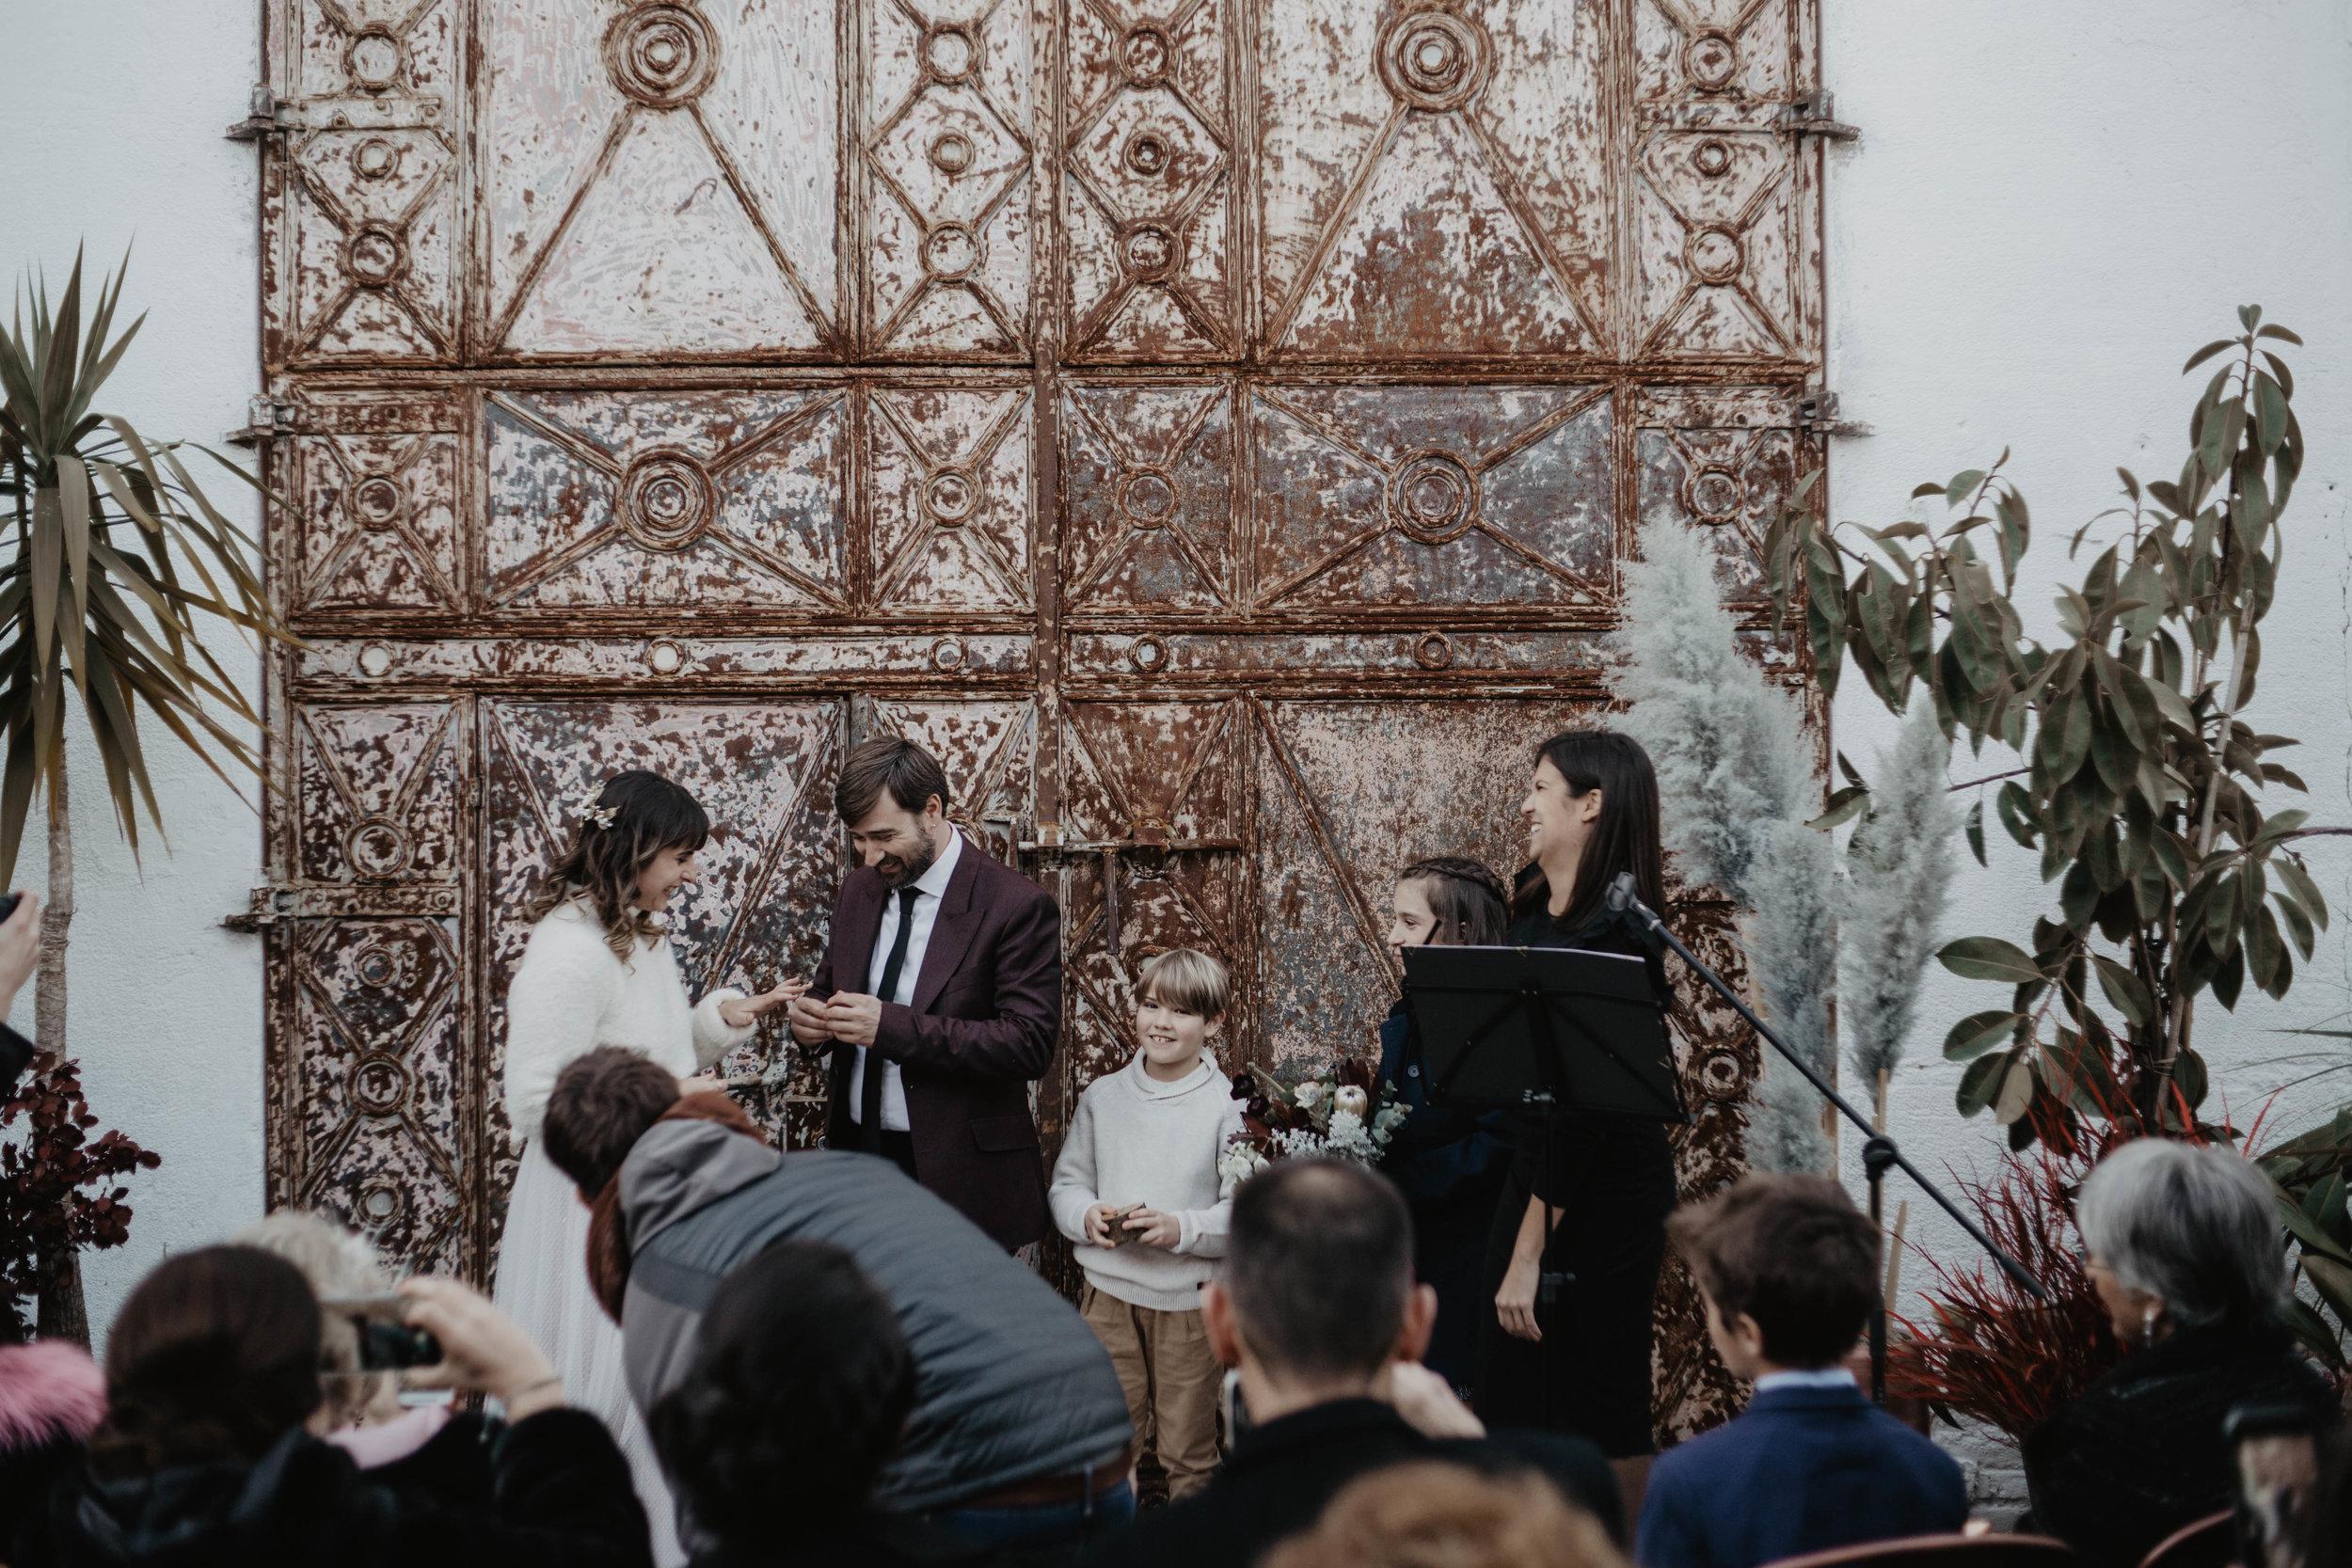 thenortherngirlphotography-photography-weddingphotography-couple-bodasconestilo-bodasenbarcelona-martadavid-630.jpg